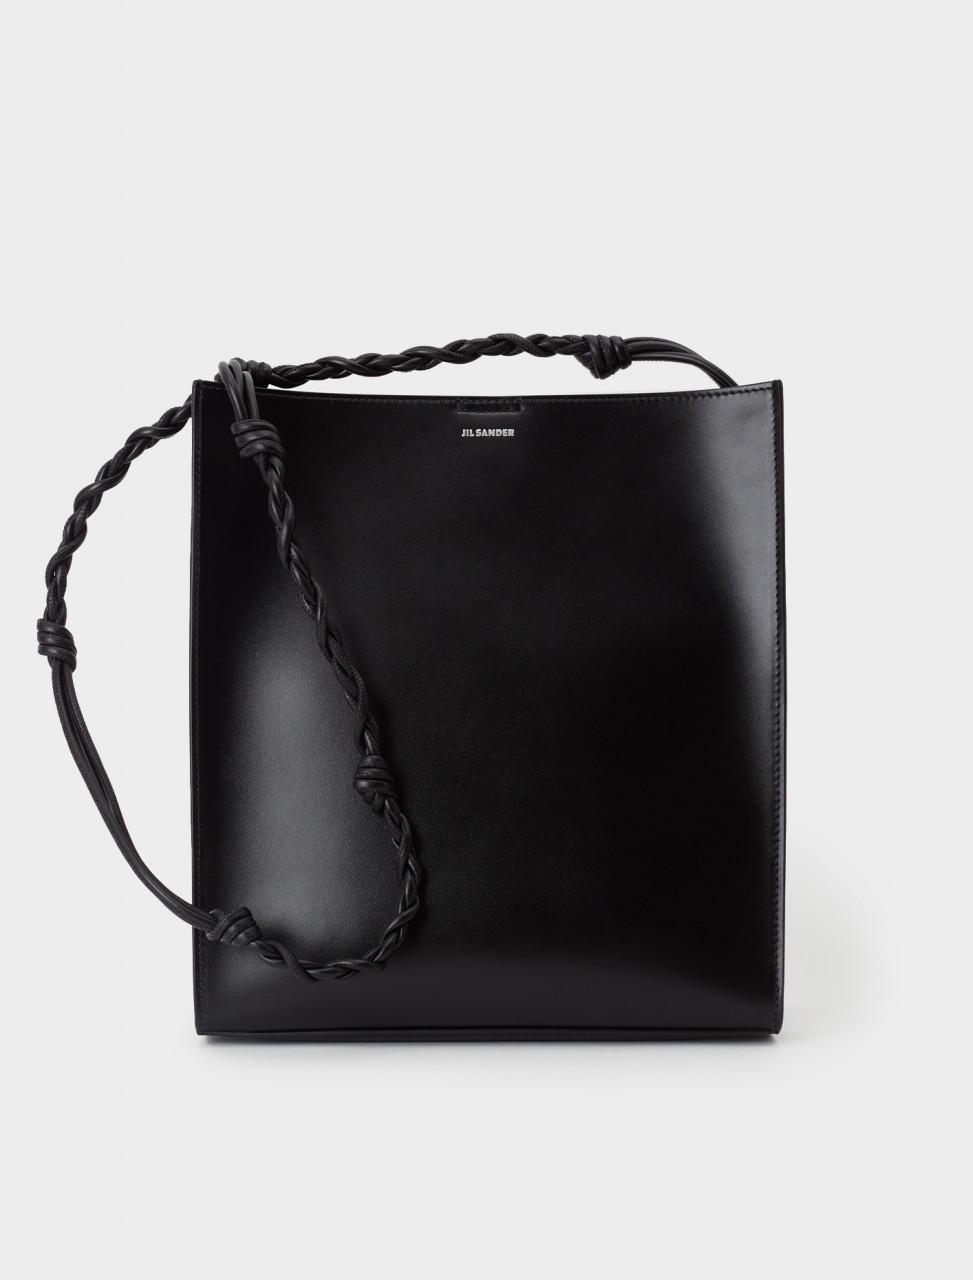 130-JSPR853172-WRB69146N-001 Jil Sander Tangle Medium Bag in Black